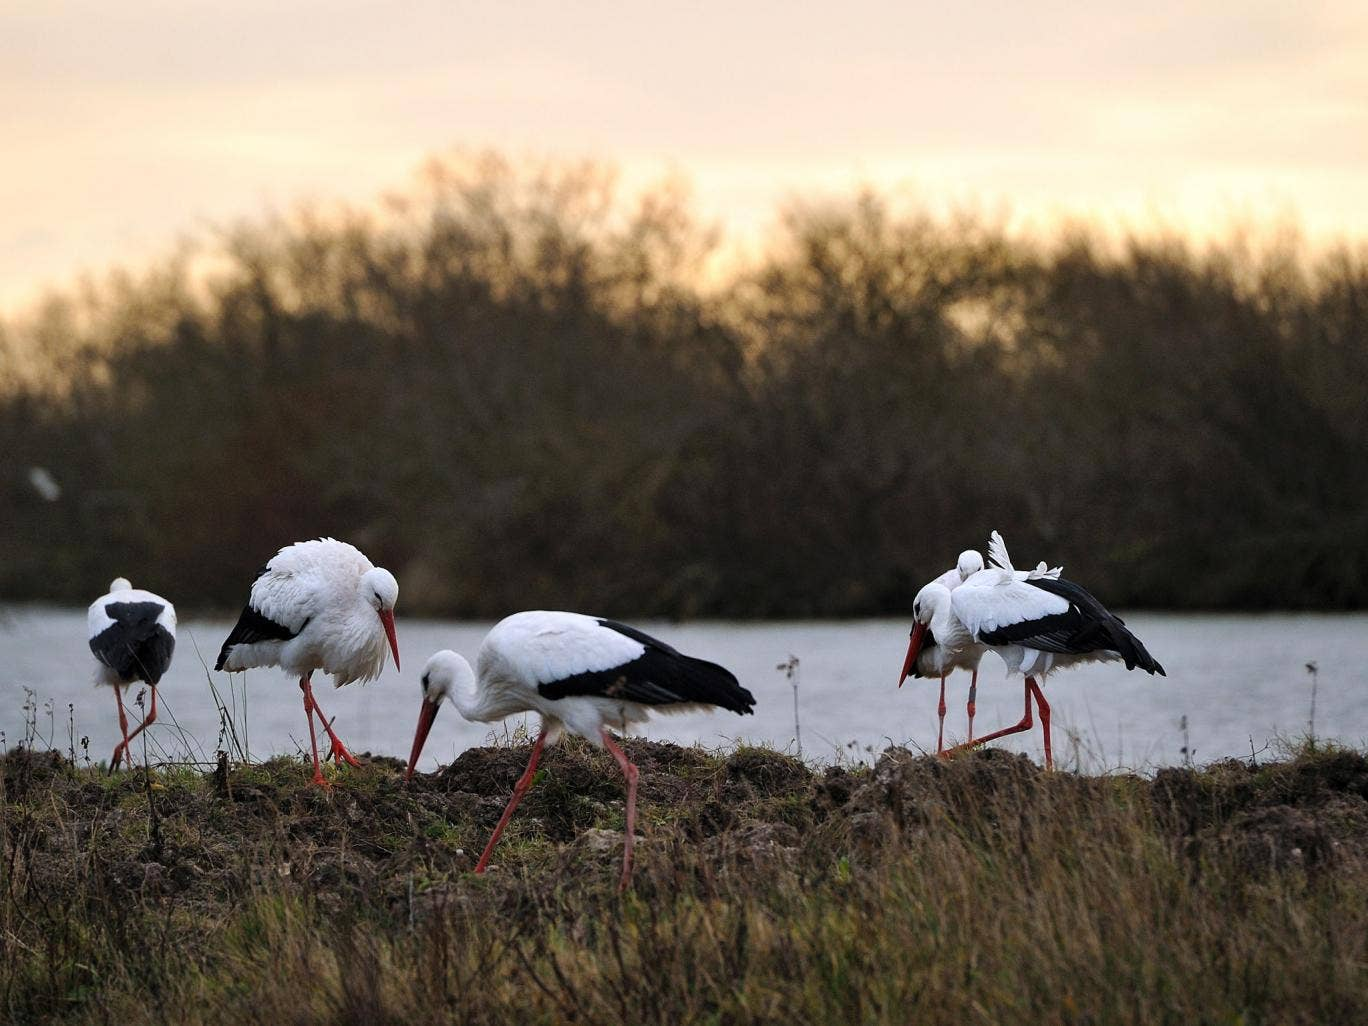 Beak district: Storks are among the abundant birdlife in the Parc du Marquenterre